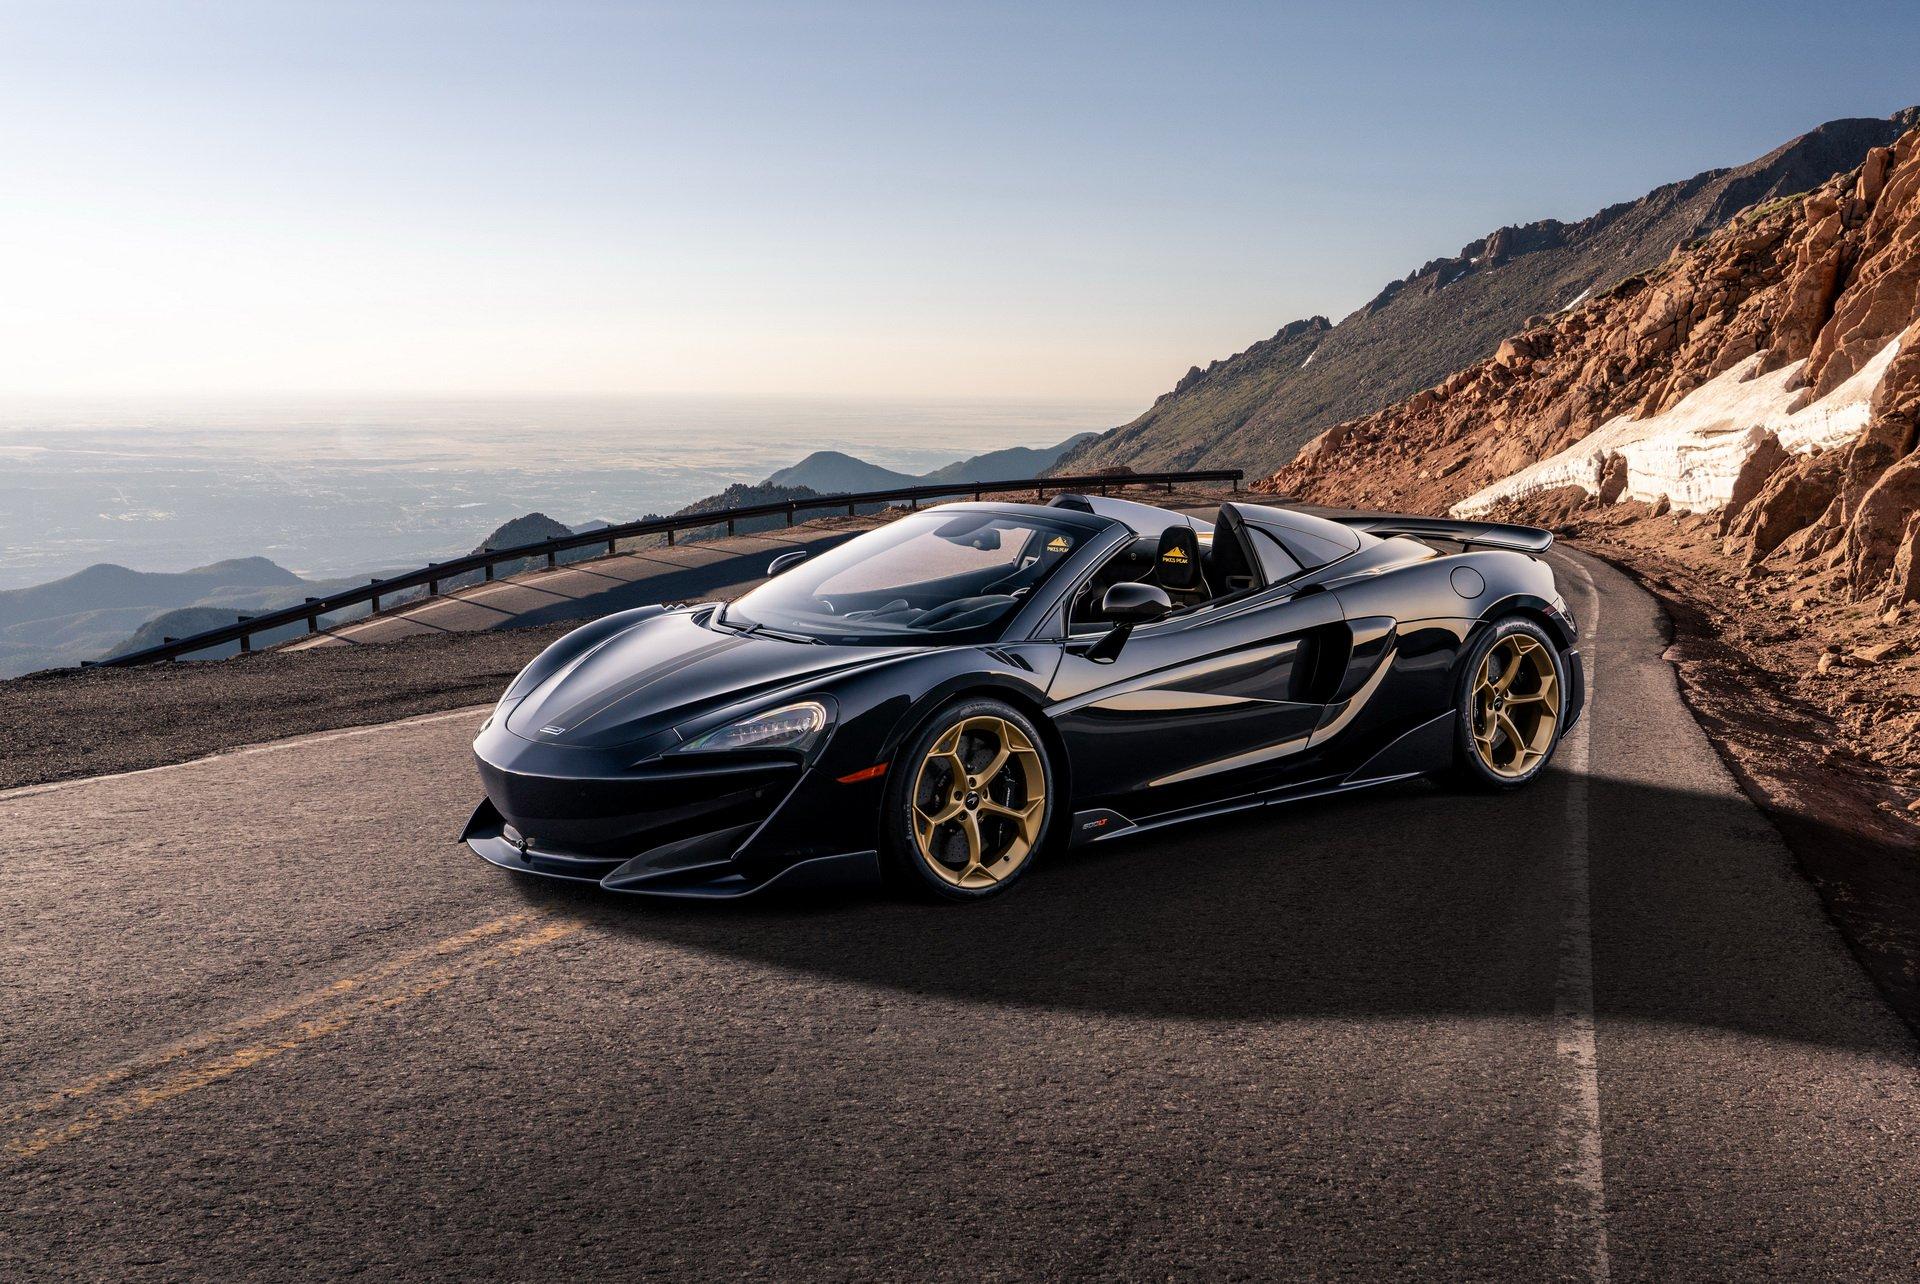 McLaren-600LT-Spider-Pikes-Peak-Collection-by-MSO-4